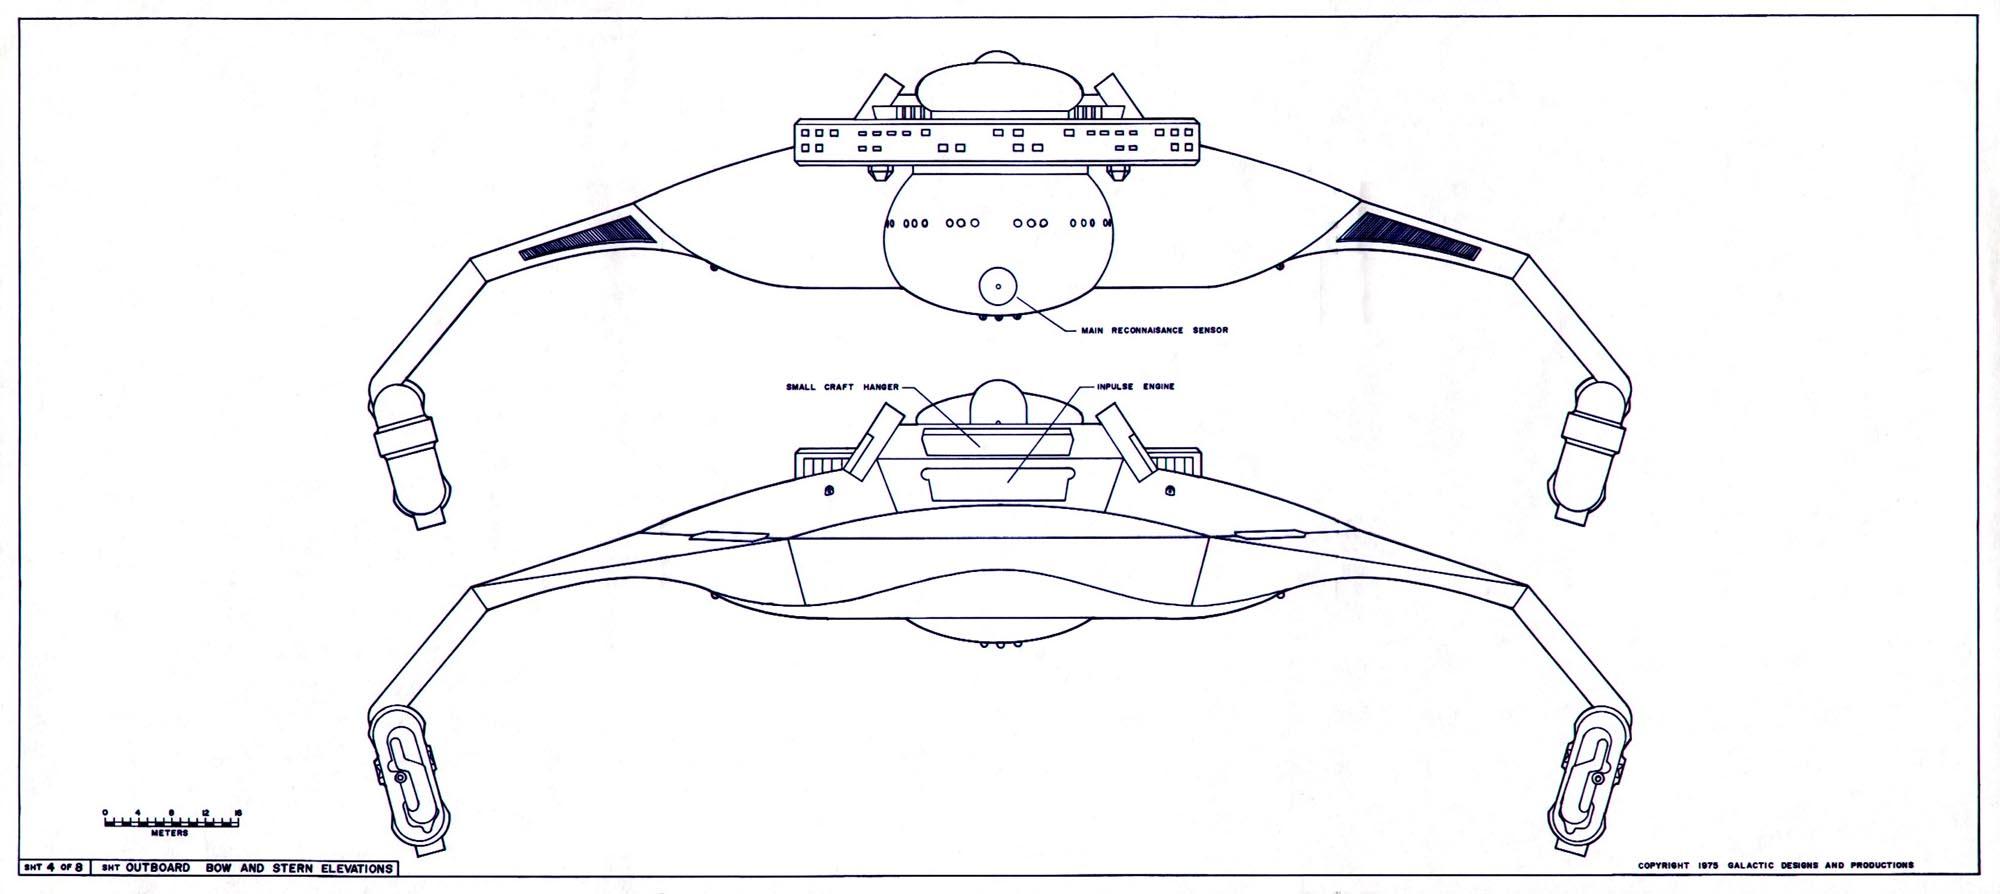 jaguar air suspension problems  jaguar  wiring diagram images